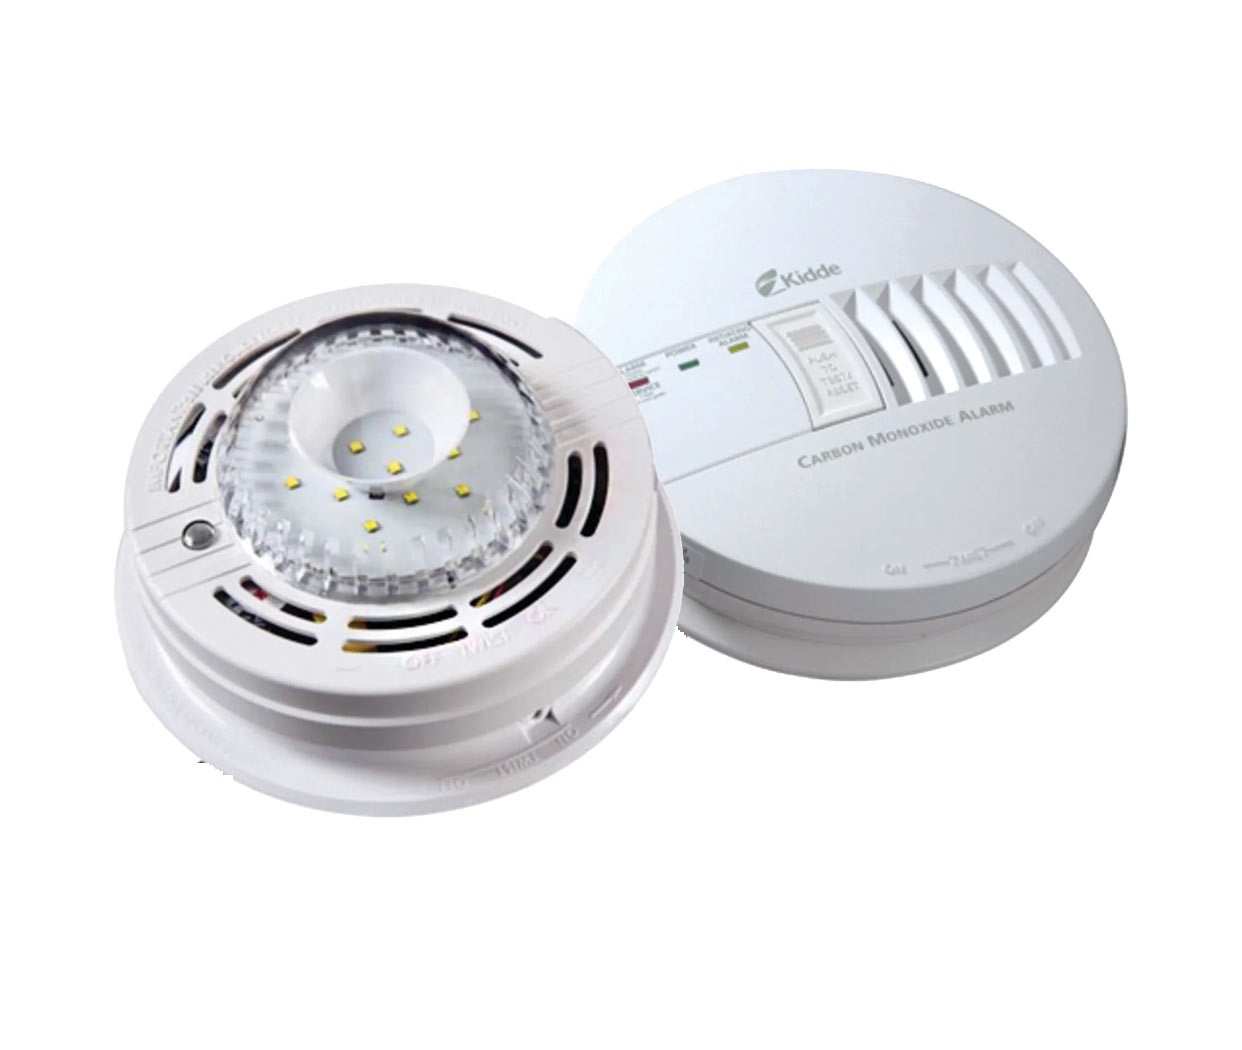 Kidde Carbon Monoxide Alarm with Strobe Light